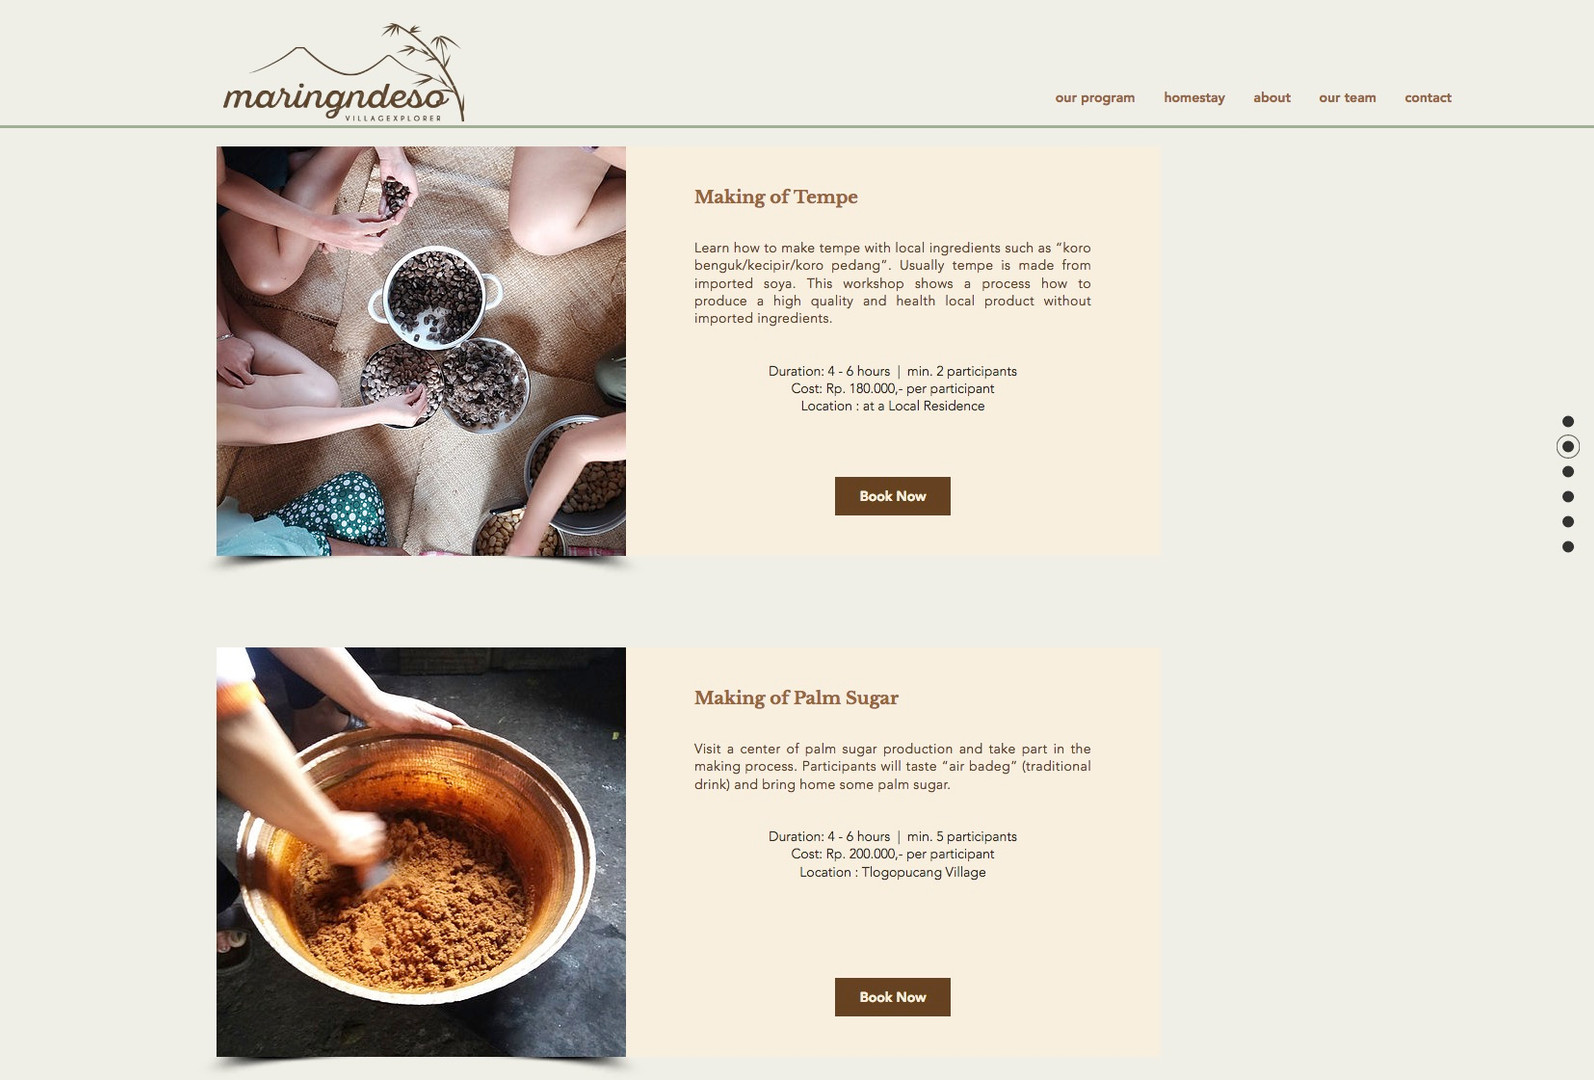 Maring nDeso Website